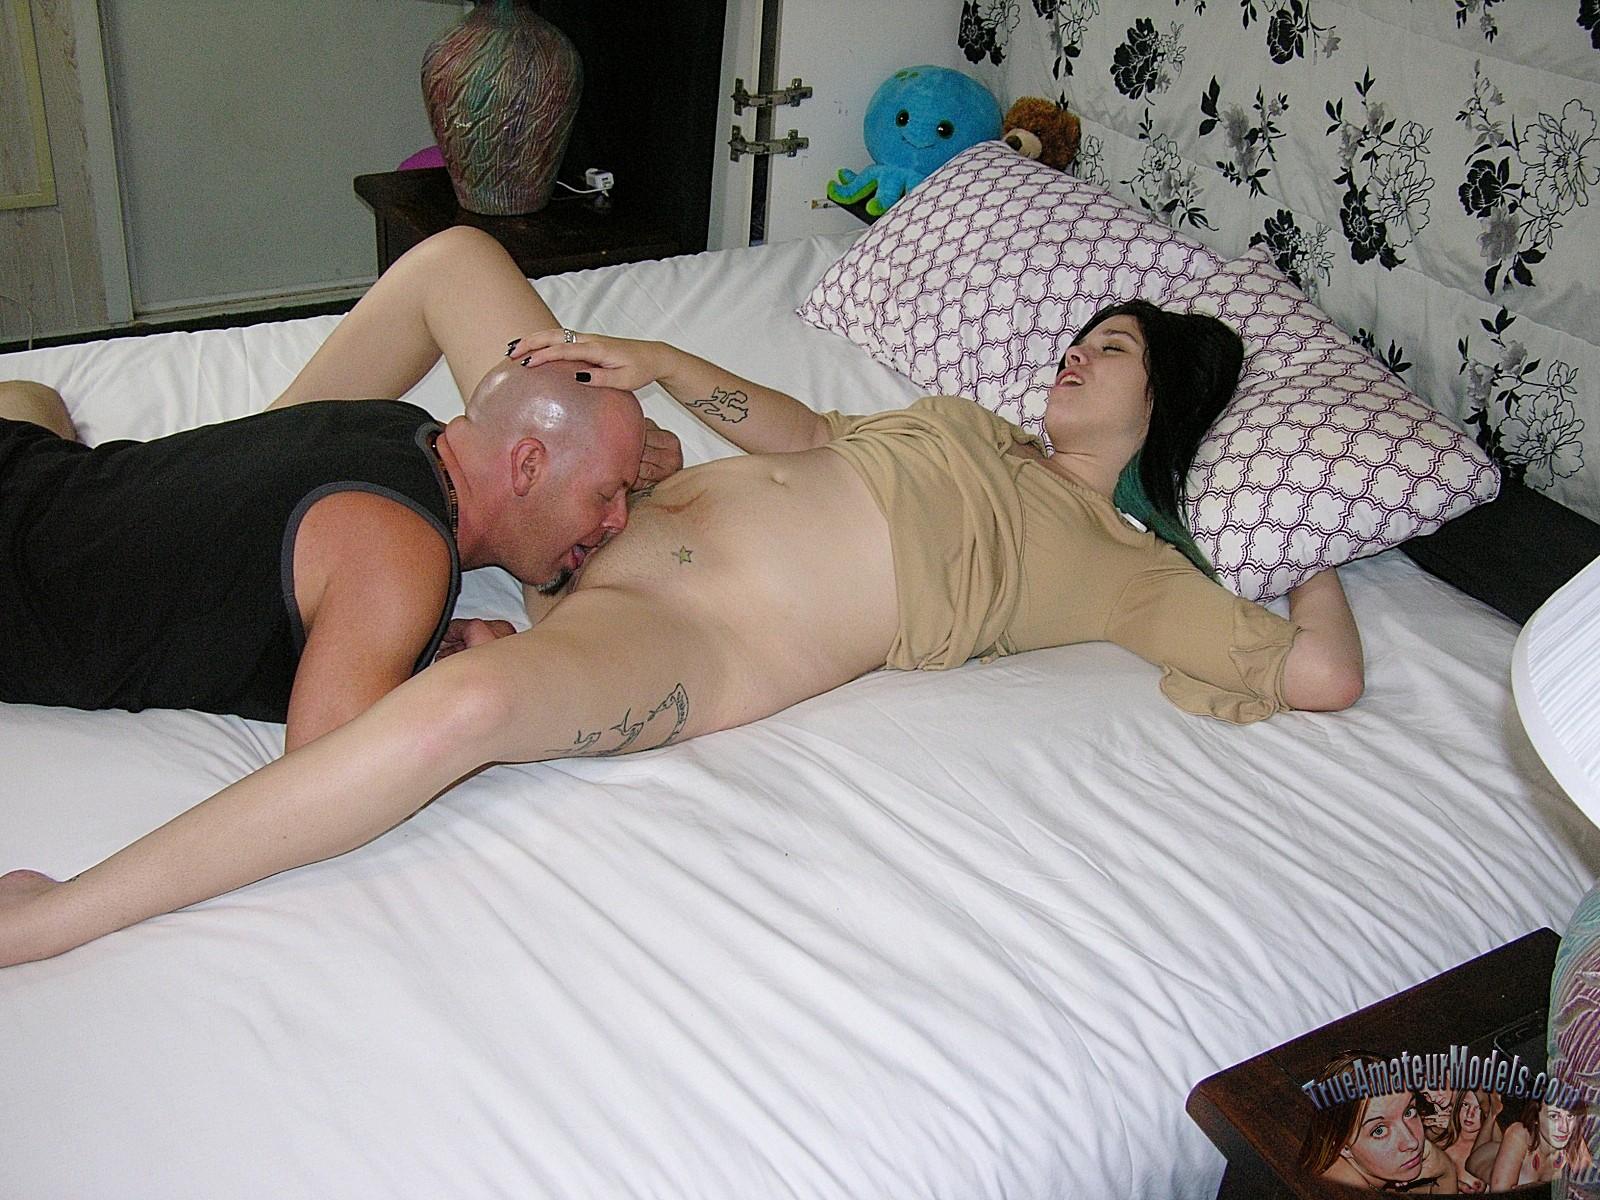 true-amateur-models-porn-shoot2ray-edwards